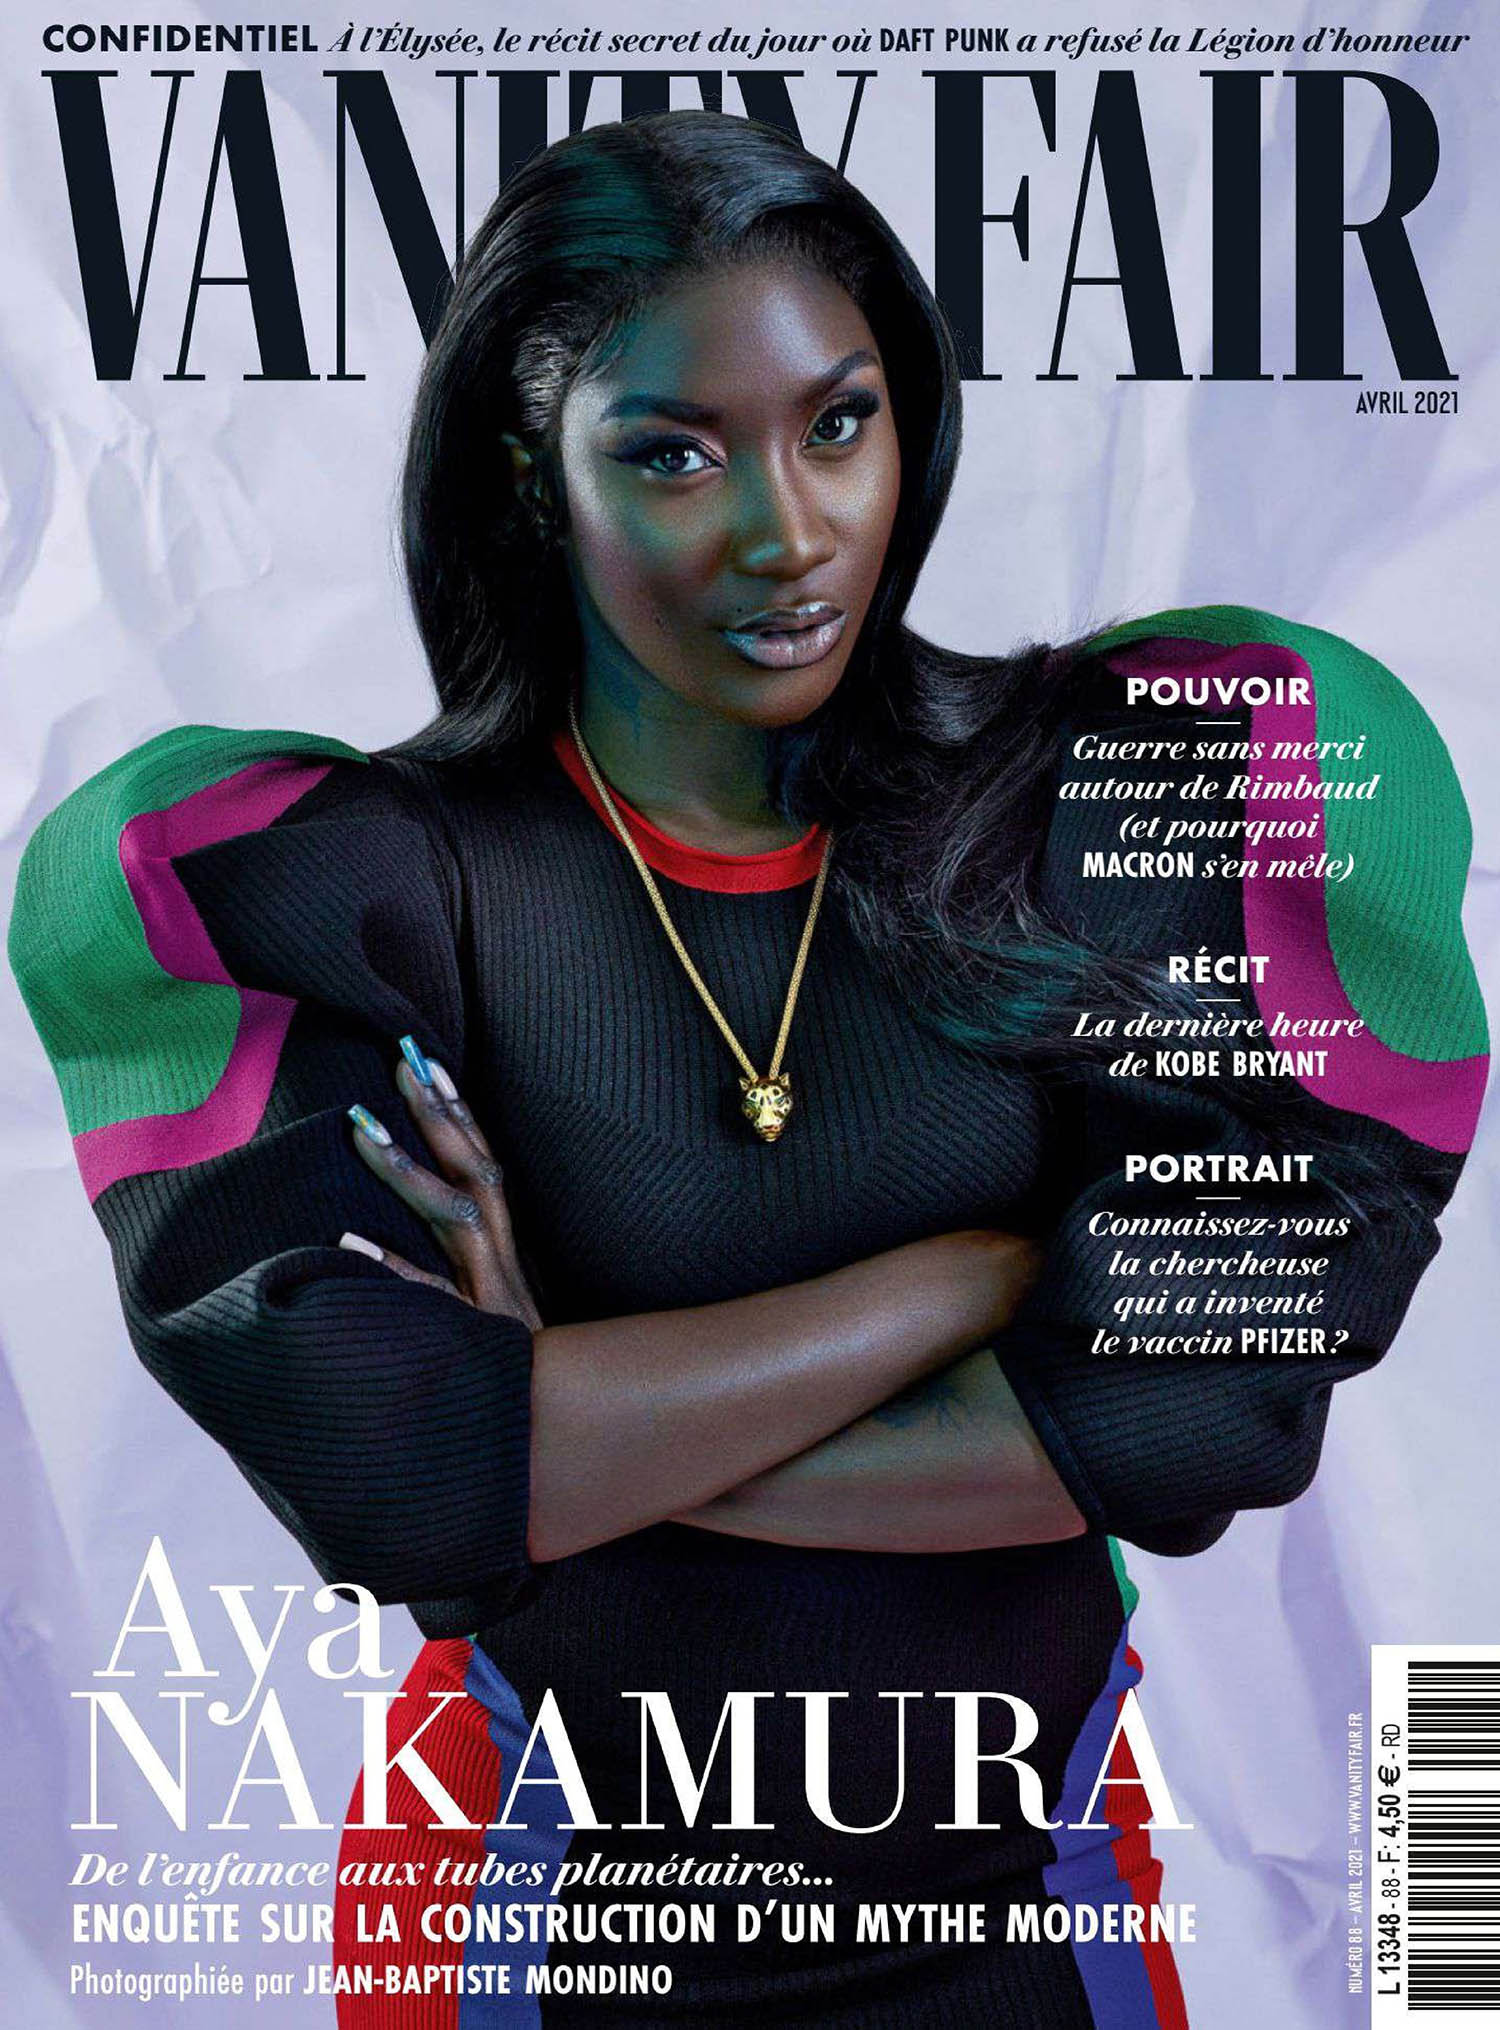 Aya Nakamura covers Vanity Fair France April 2021 by Jean-Baptiste Mondino